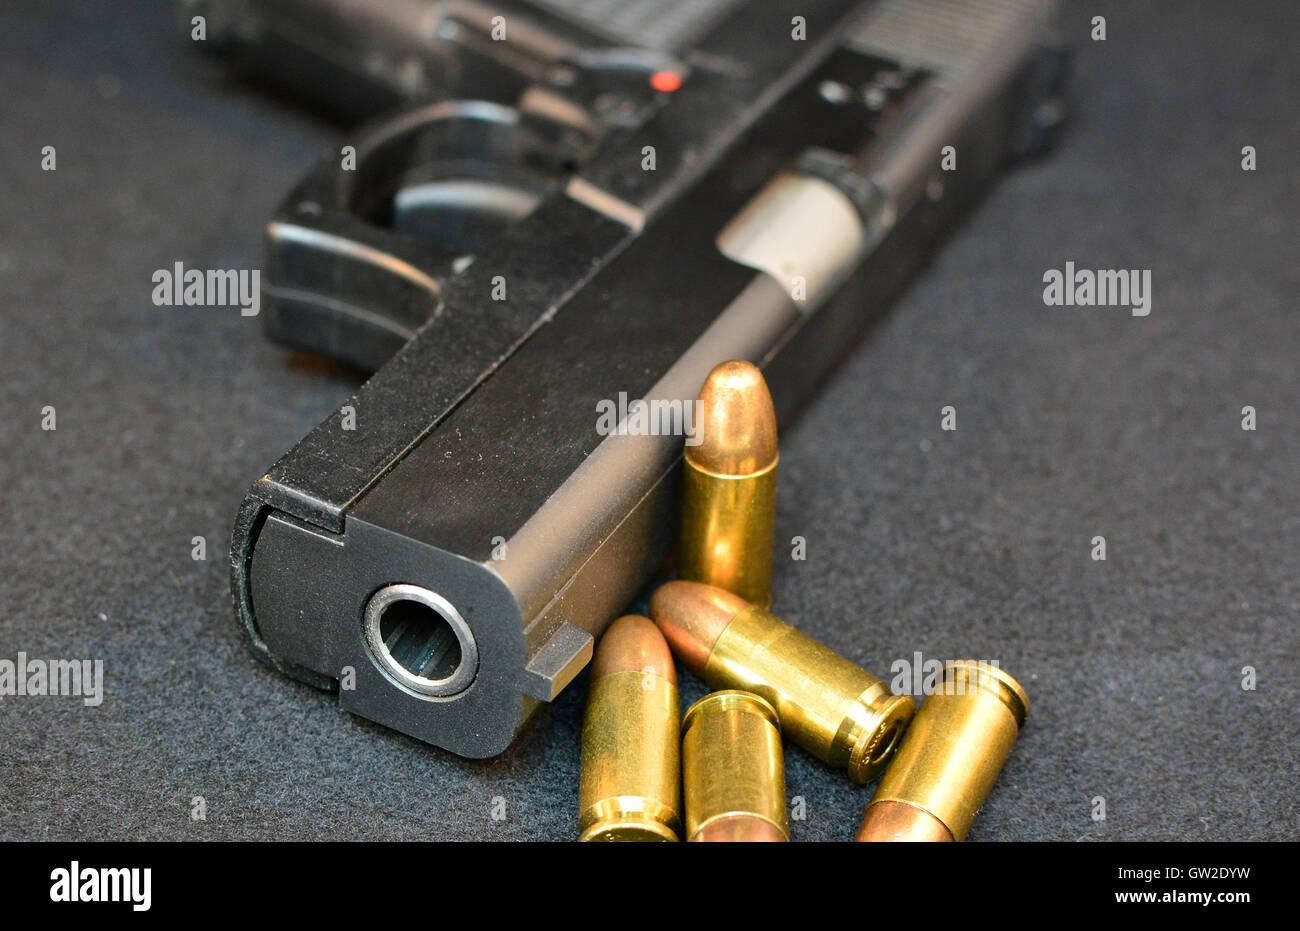 Handgun with bullets. Gun violent crime, assault. Shooting. Gun use. - Stock Image